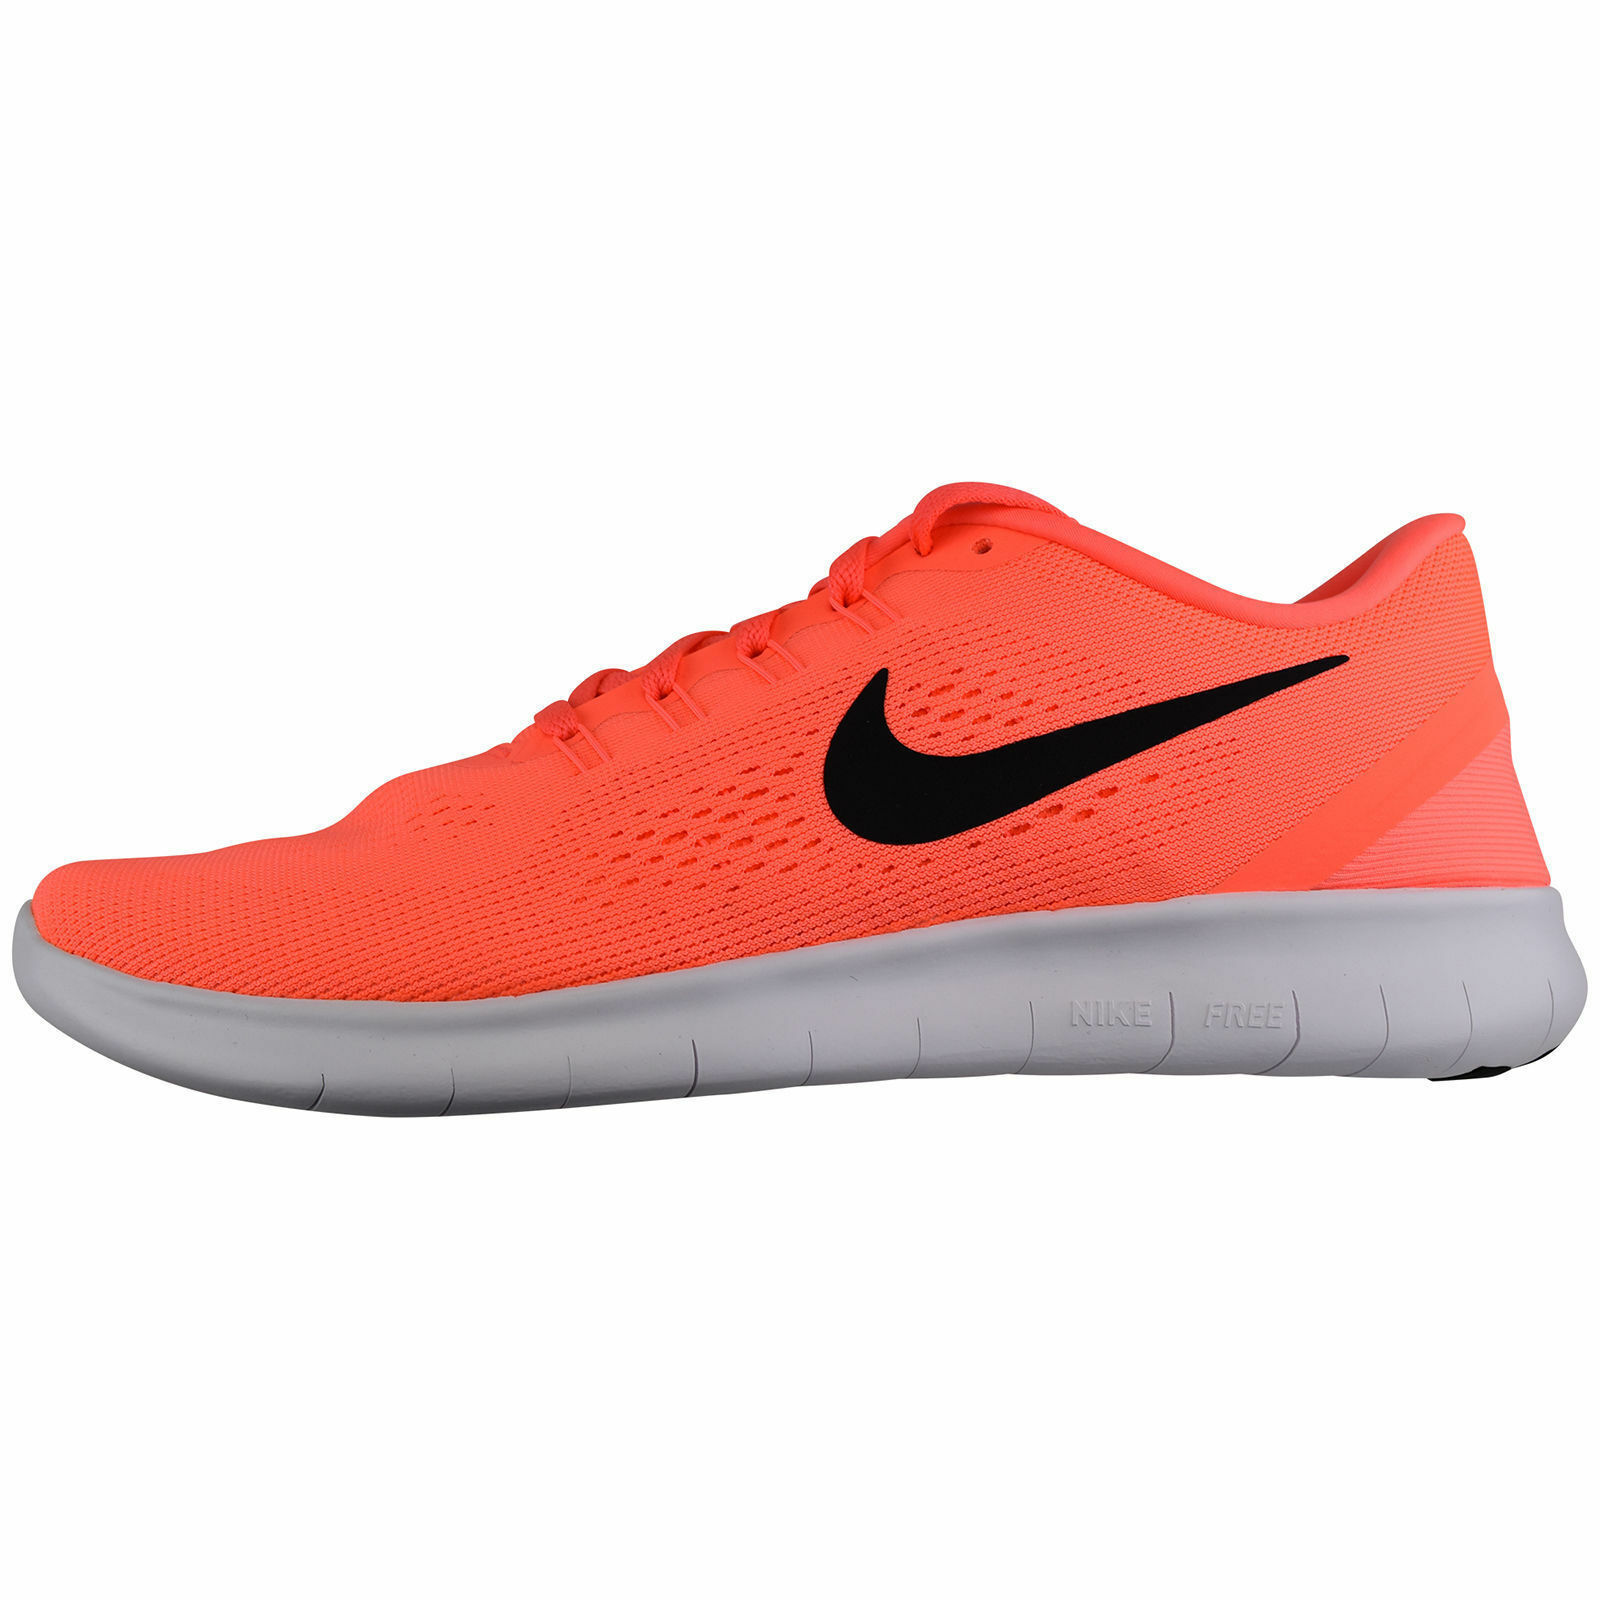 WMNS Nike  Free RN 831509 802  Nike Shoes Bright Mango Size: 5 - 6.5 - 7.5 - 8 - 8.5 6aaa96